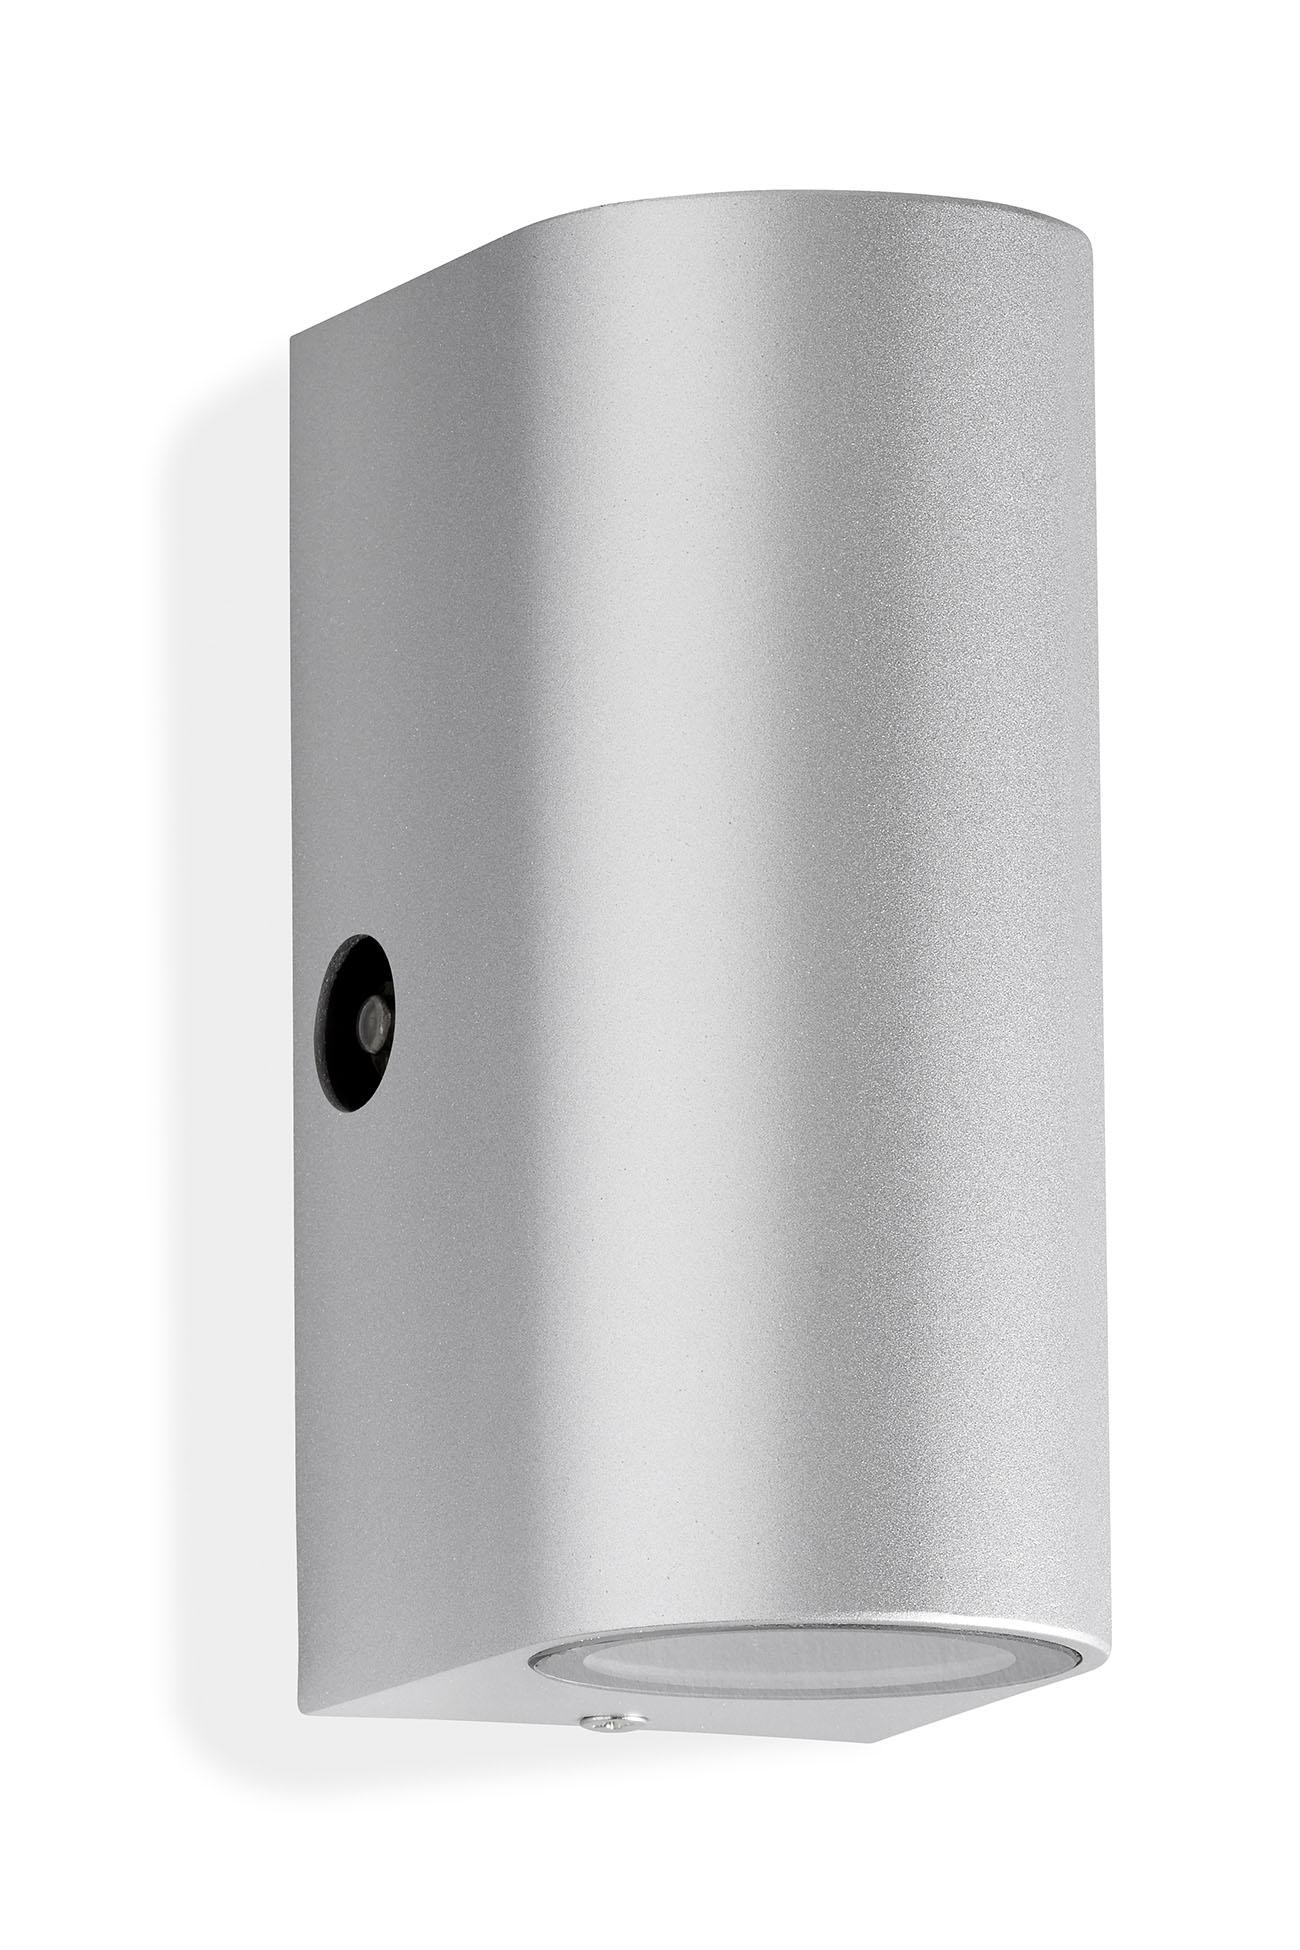 TELEFUNKEN LED Sensor Außenwandleuchte, 15,1 cm, 10 W, Silber